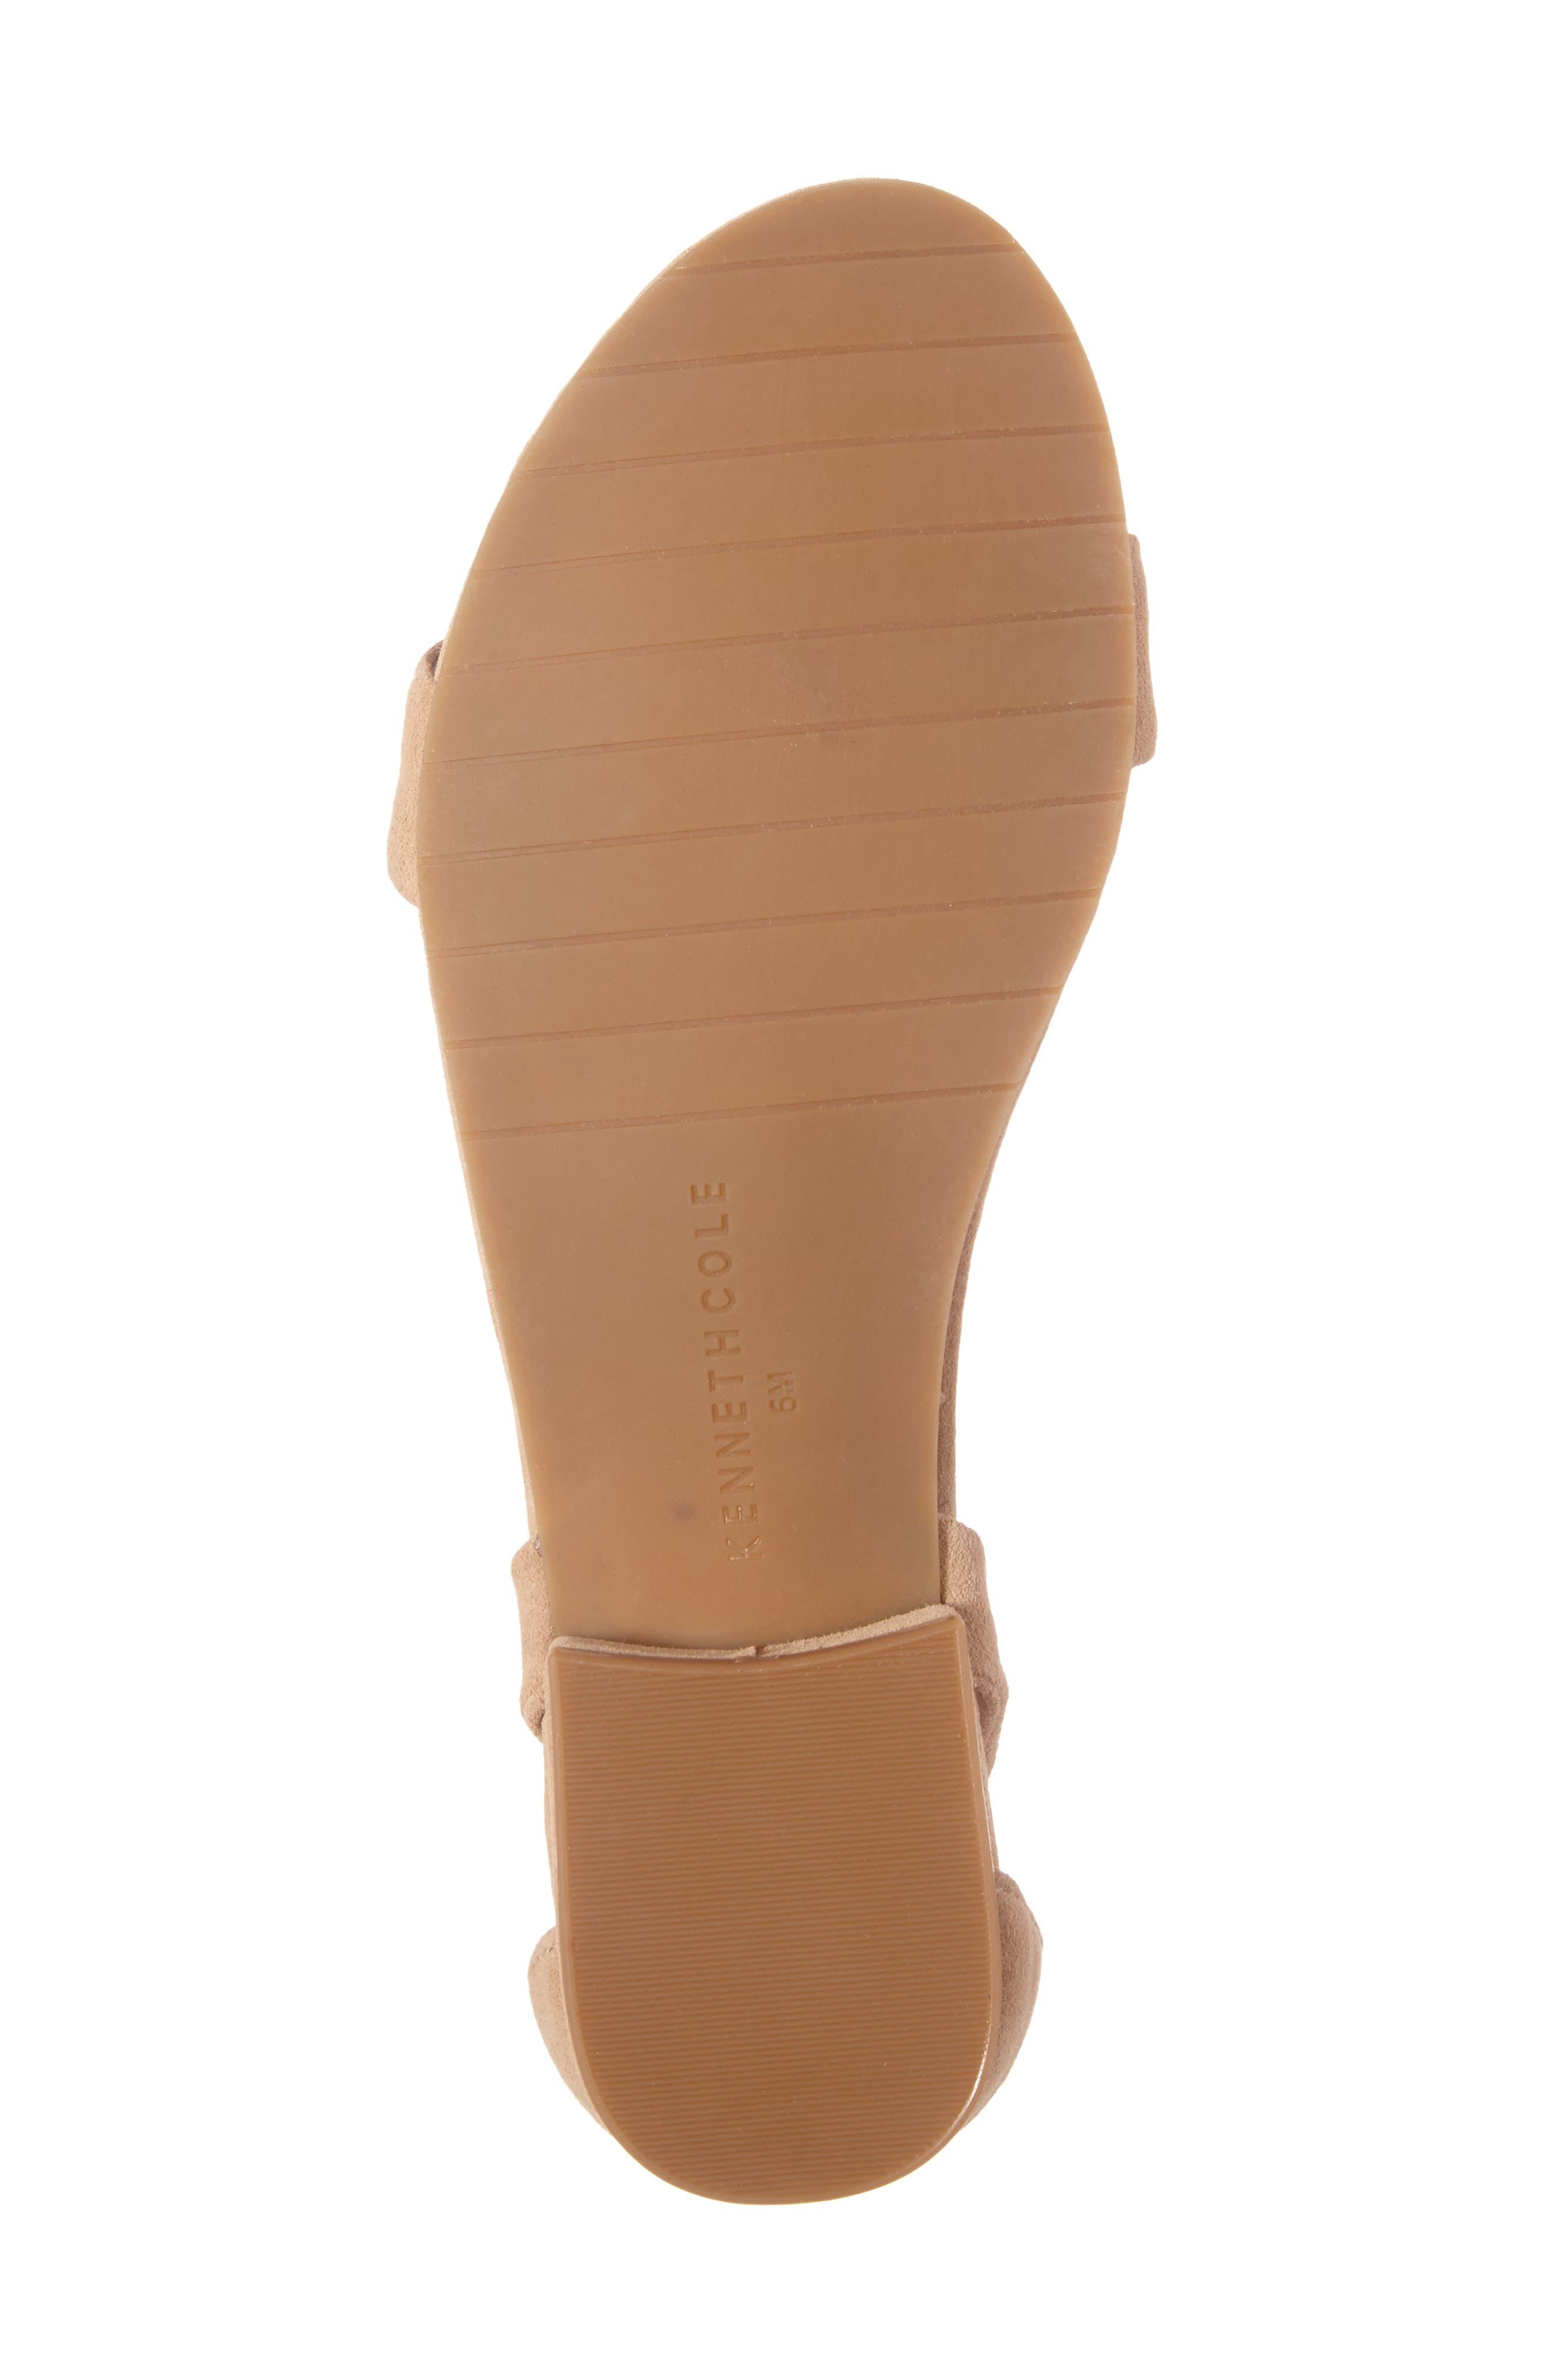 Valen Tassel Lace-Up Sandal,                             Alternate thumbnail 62, color,